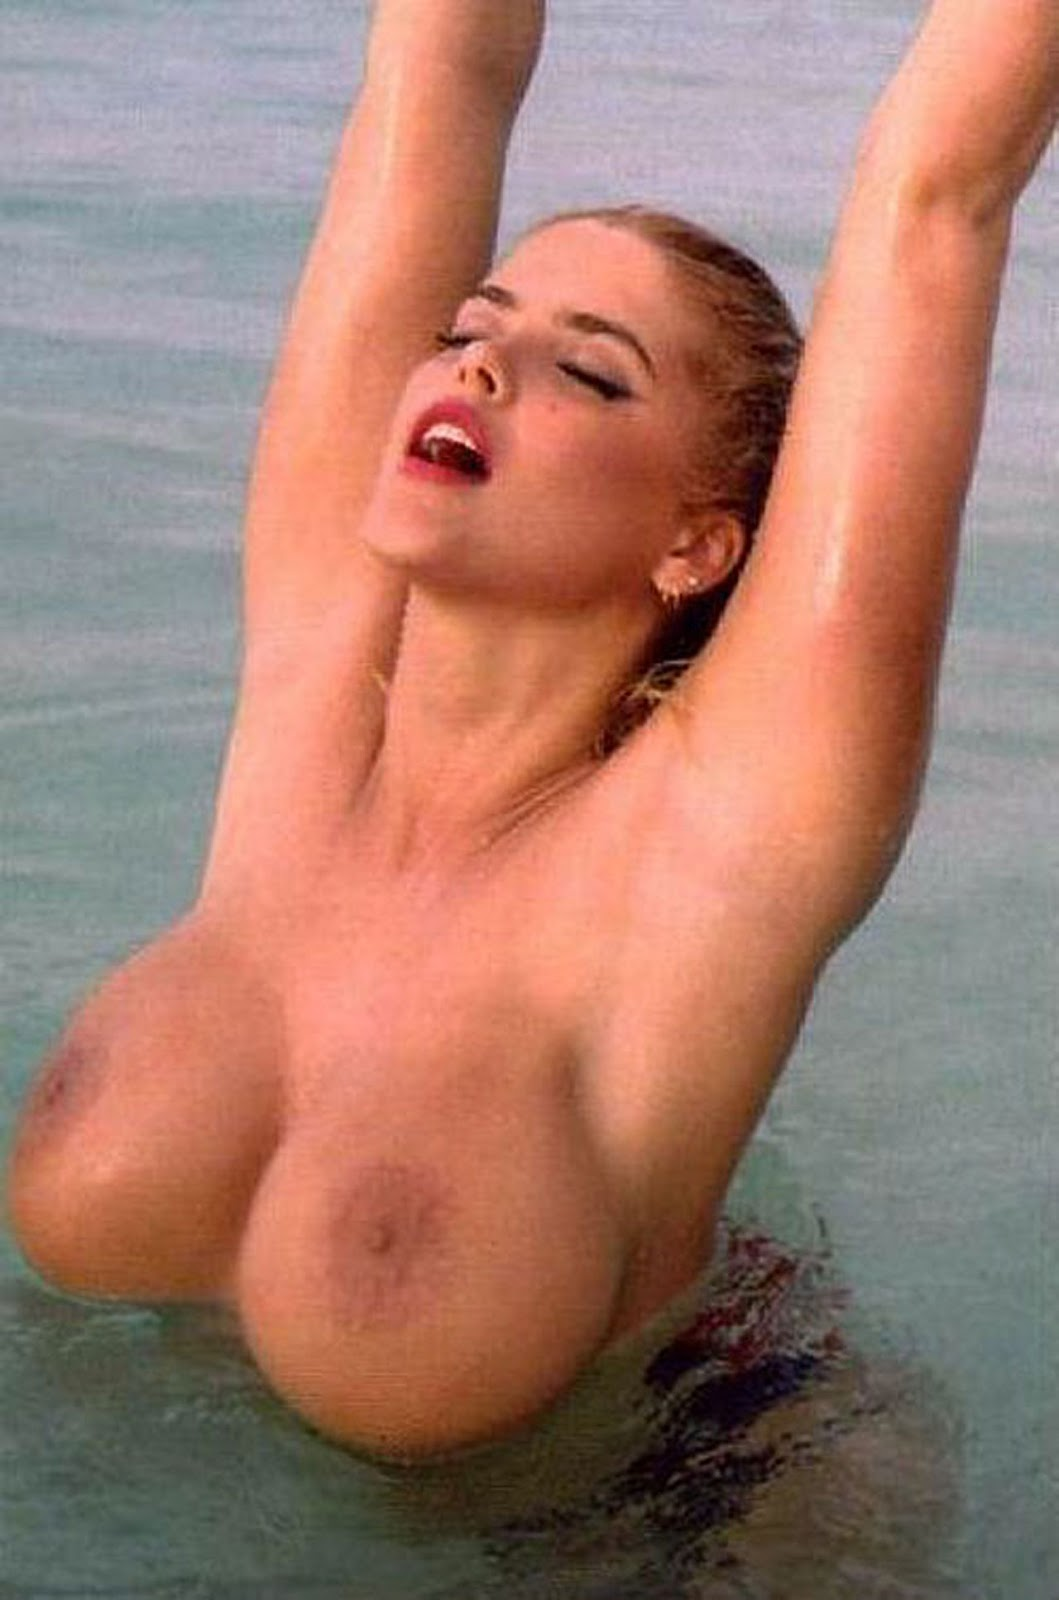 Sexy Anna Nicole Smith Tits Images Of Anna Nicole Smith Hot